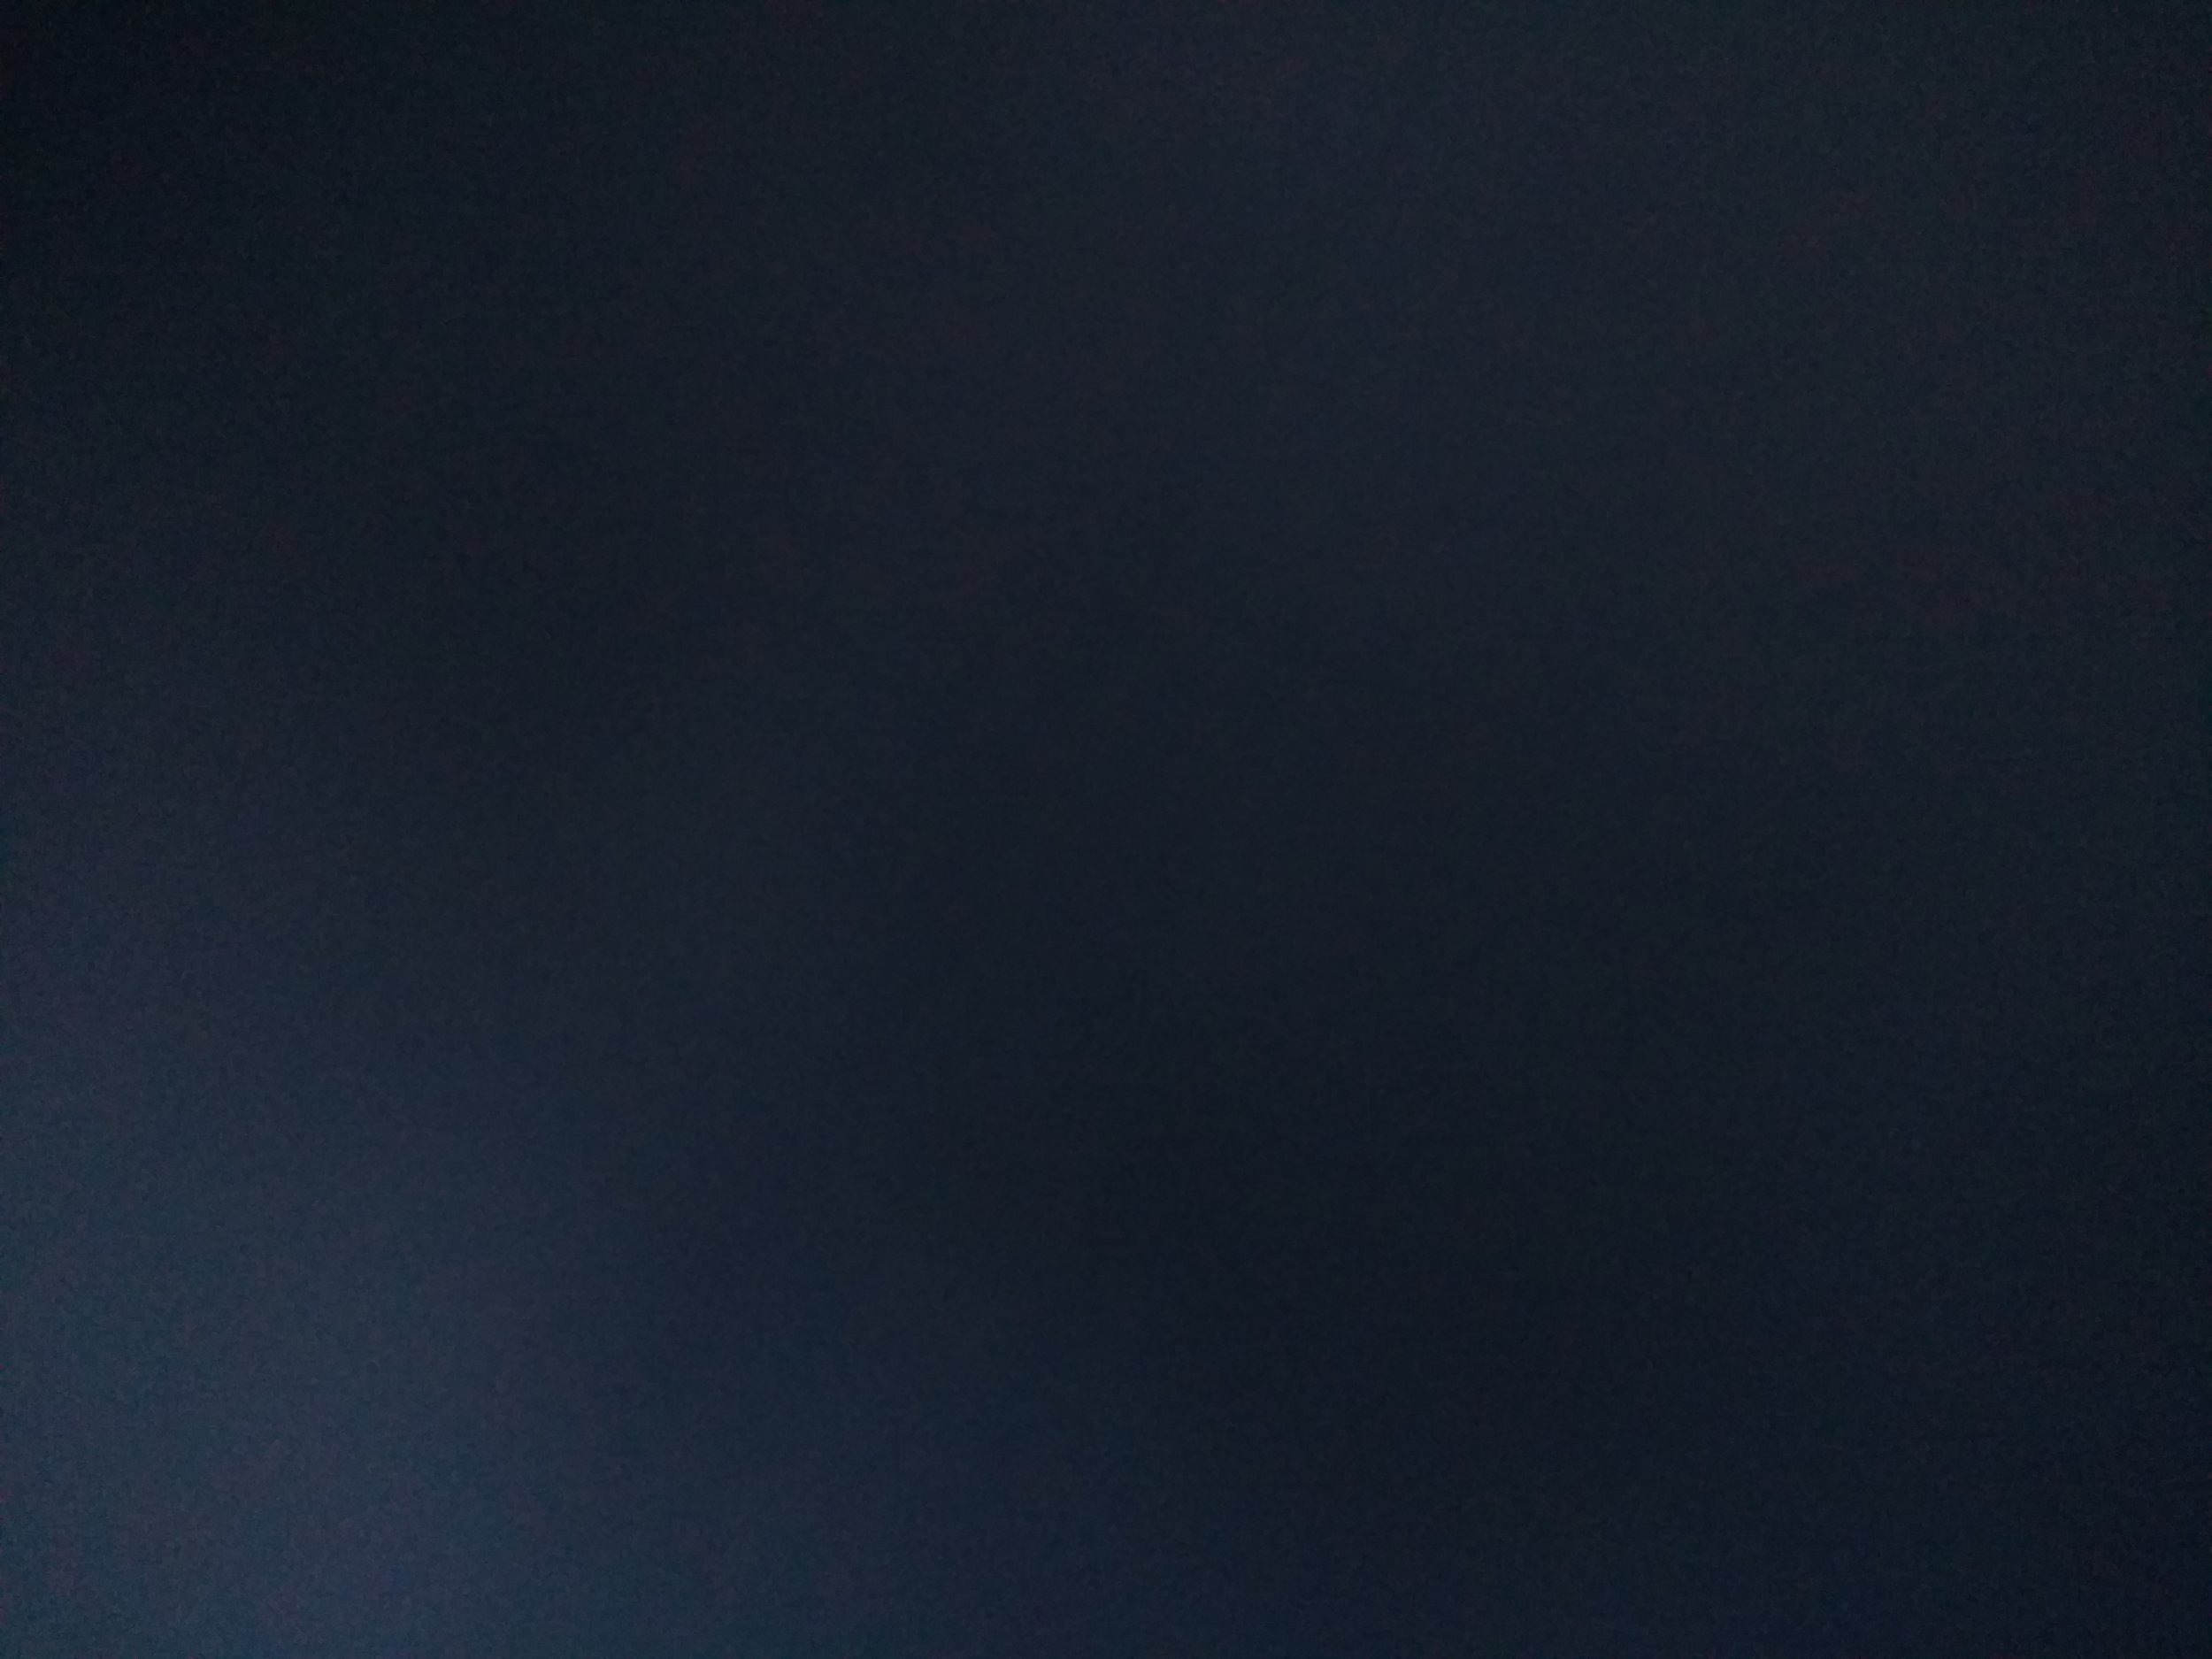 willroth-co-free-texture-gradient-084.jpg